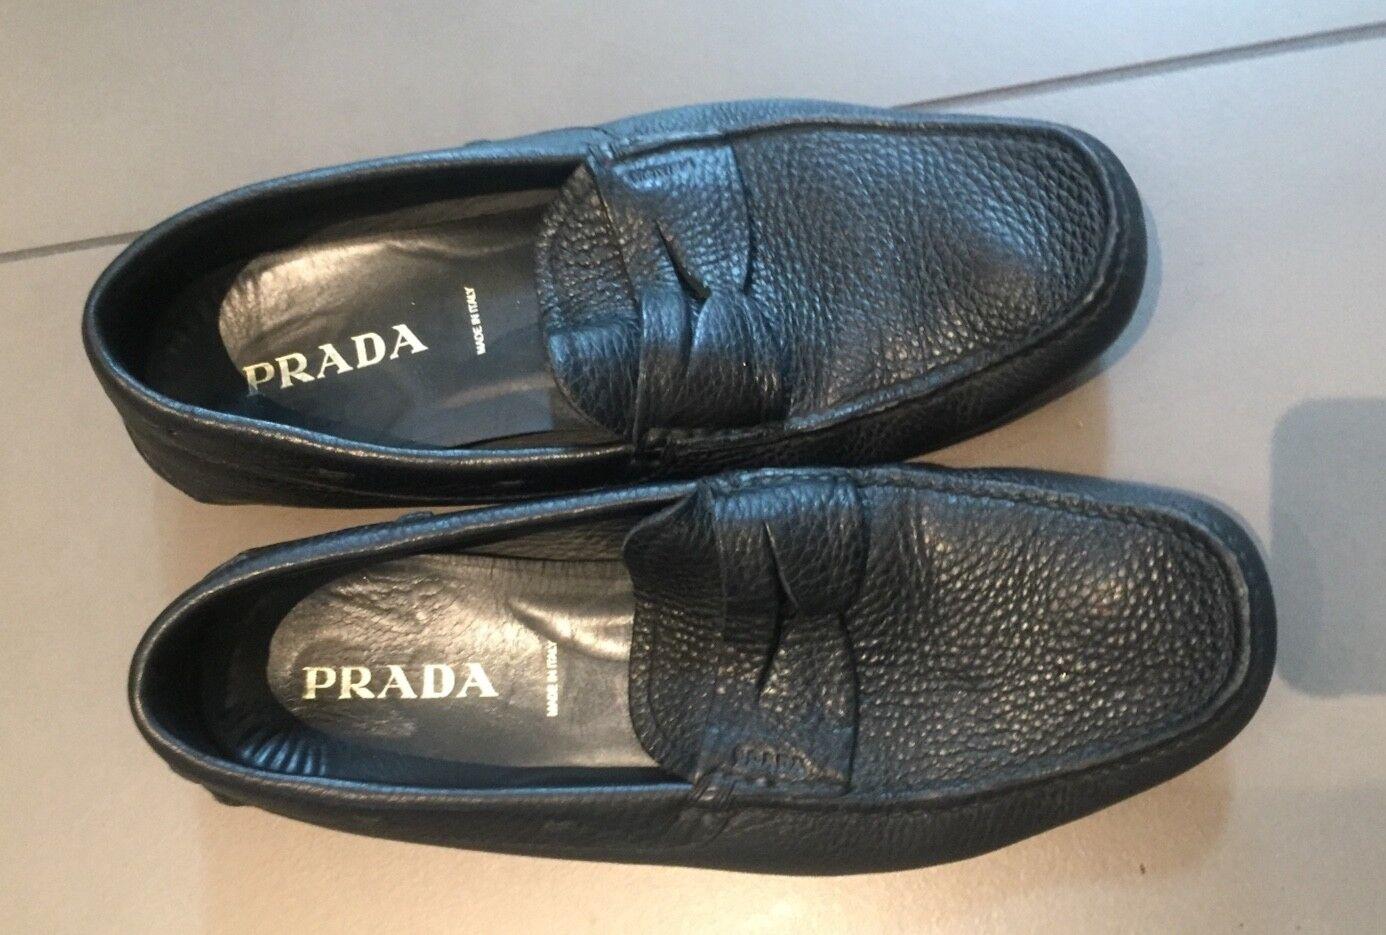 5e6c4a541 Homme Cuir Noir Prada mocassins - 10.5 onjehw2807-Chaussures ...